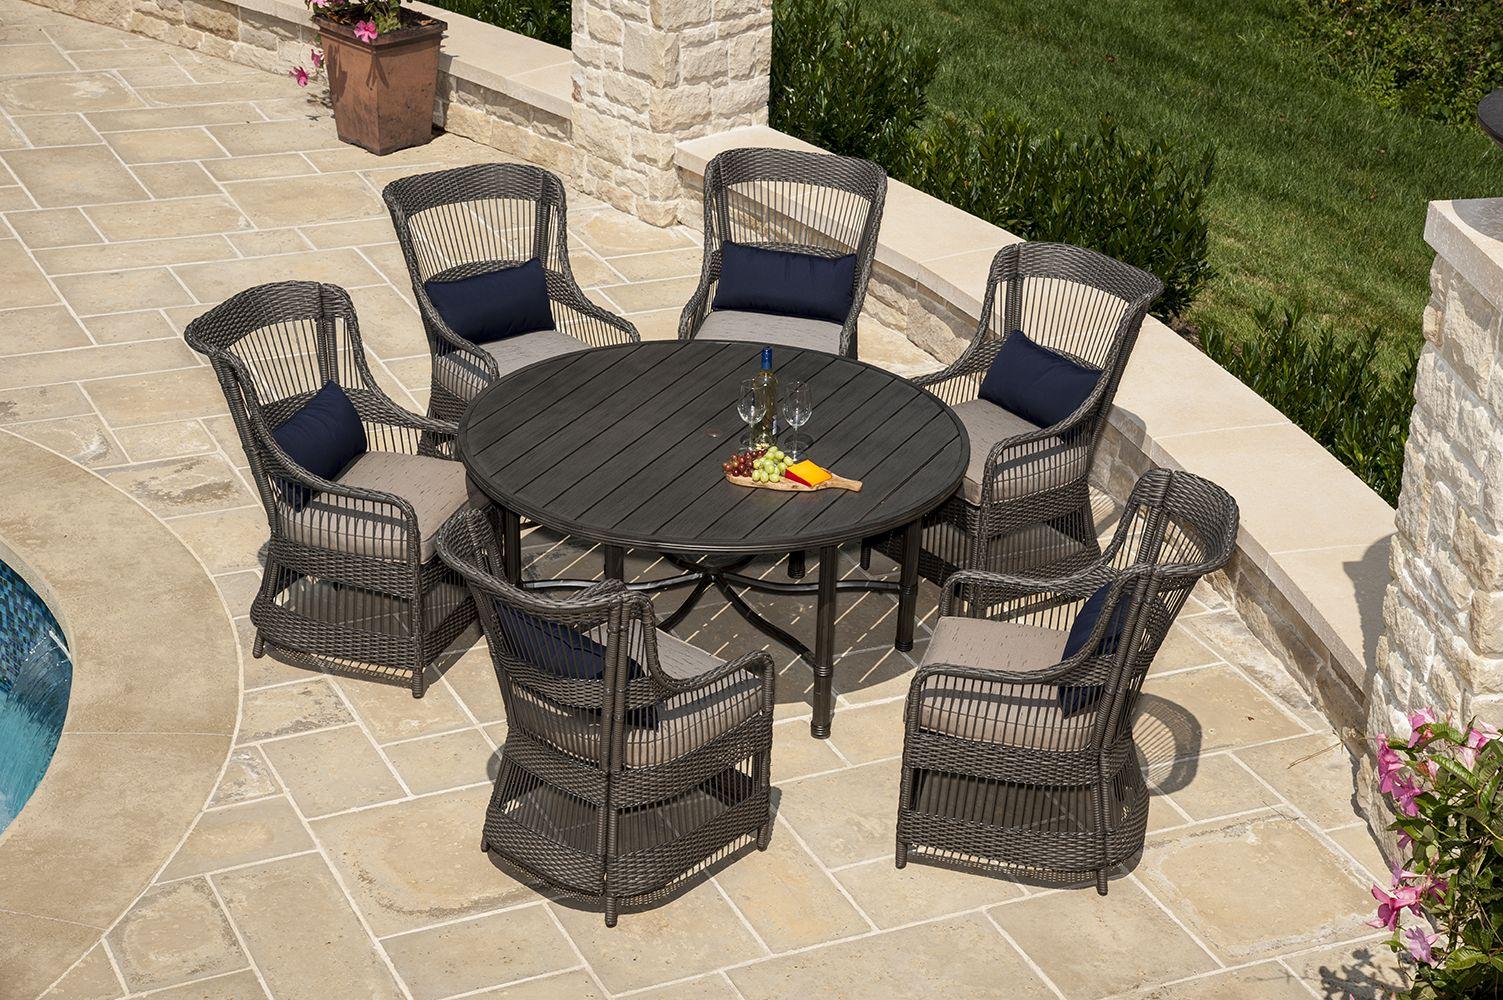 Lazboy outdoors juliette dining set patio furniture